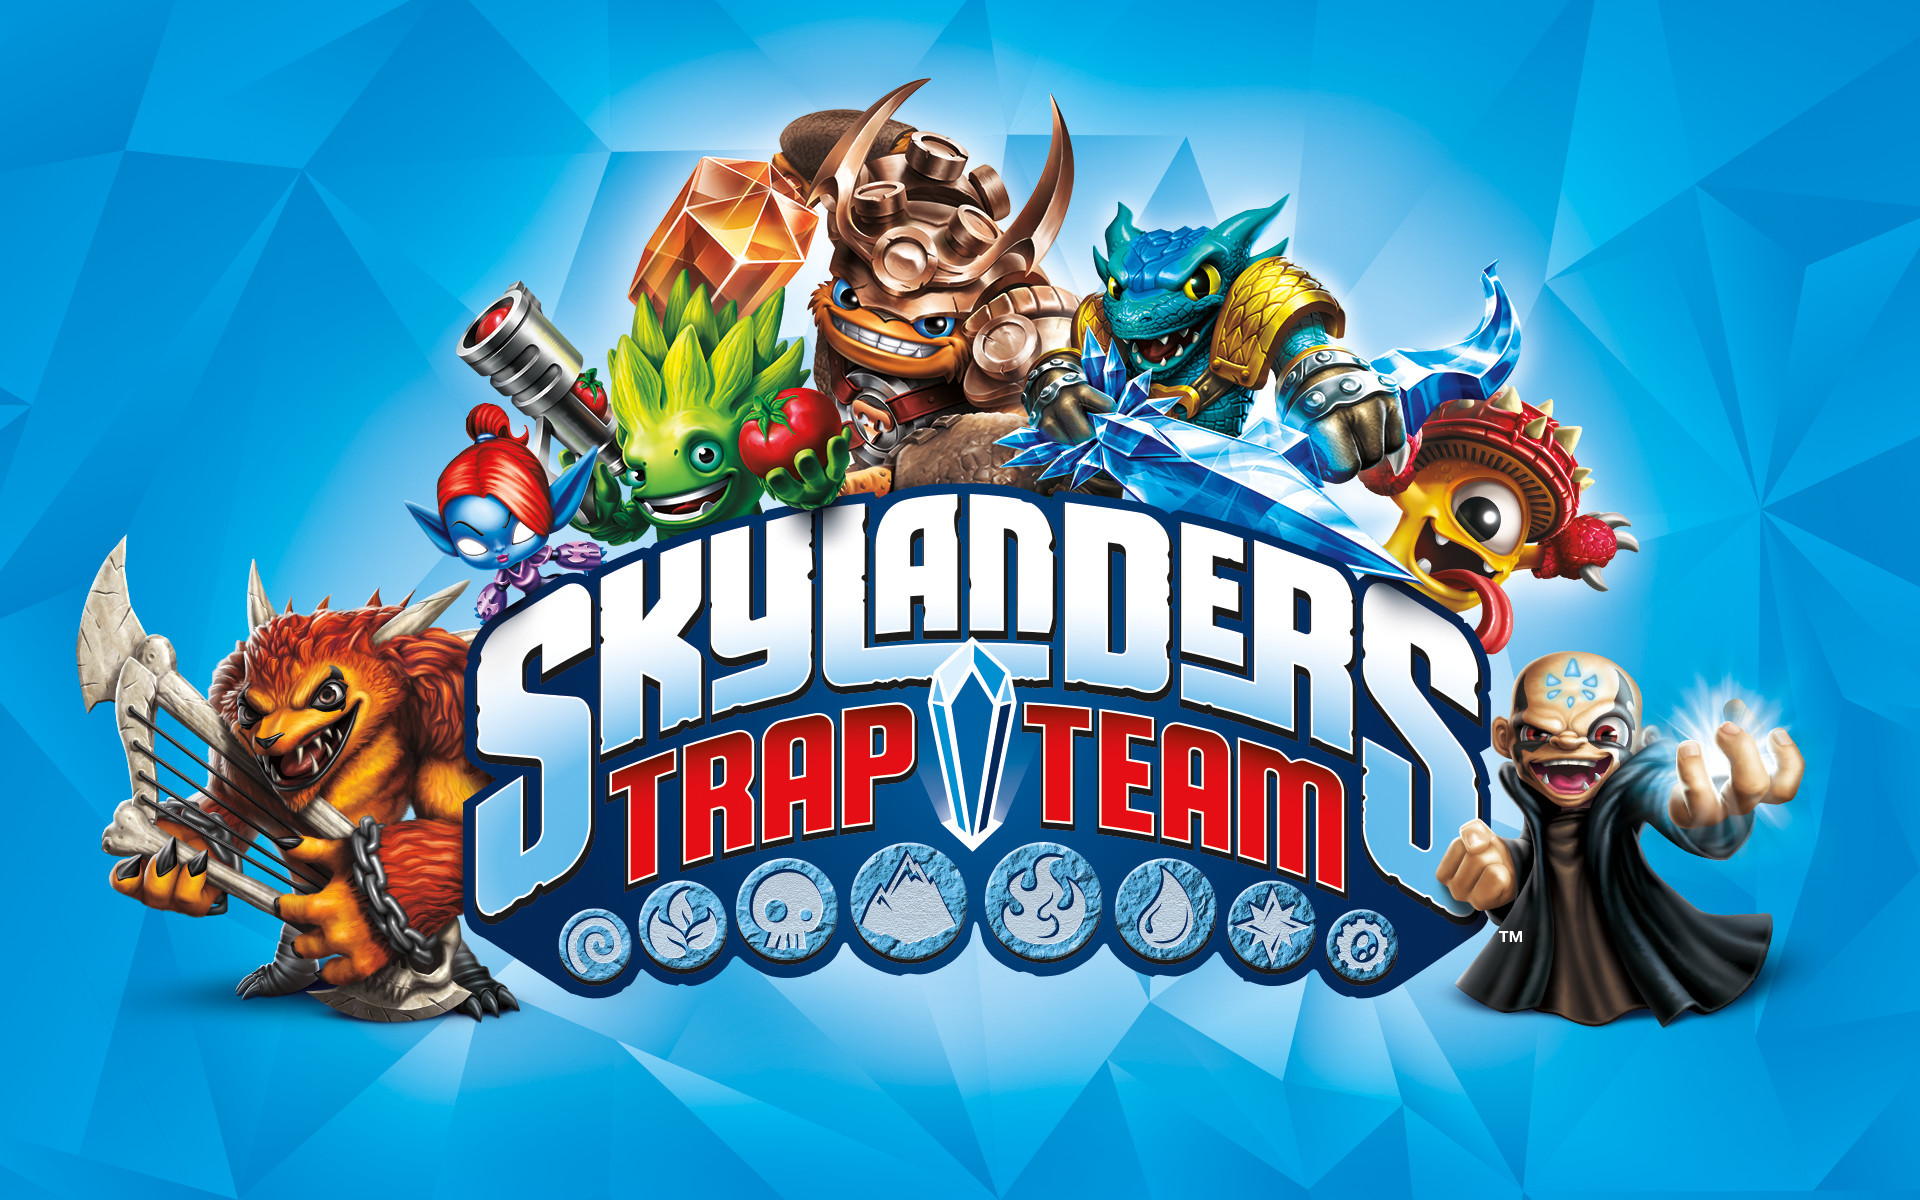 Skylanders Trap Team Wallpaper (84+ images)